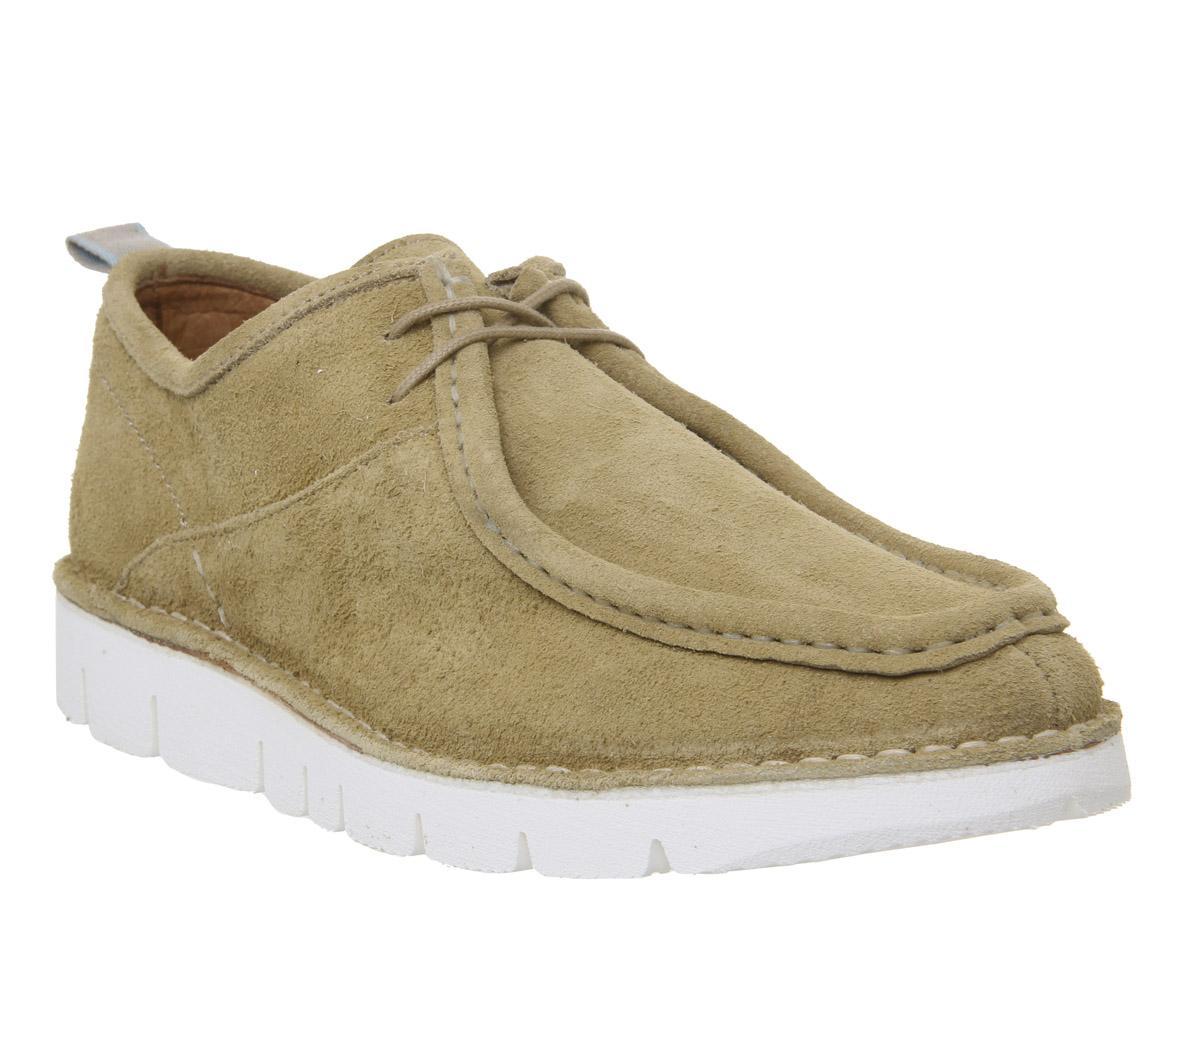 Milford Moccasins Shoe